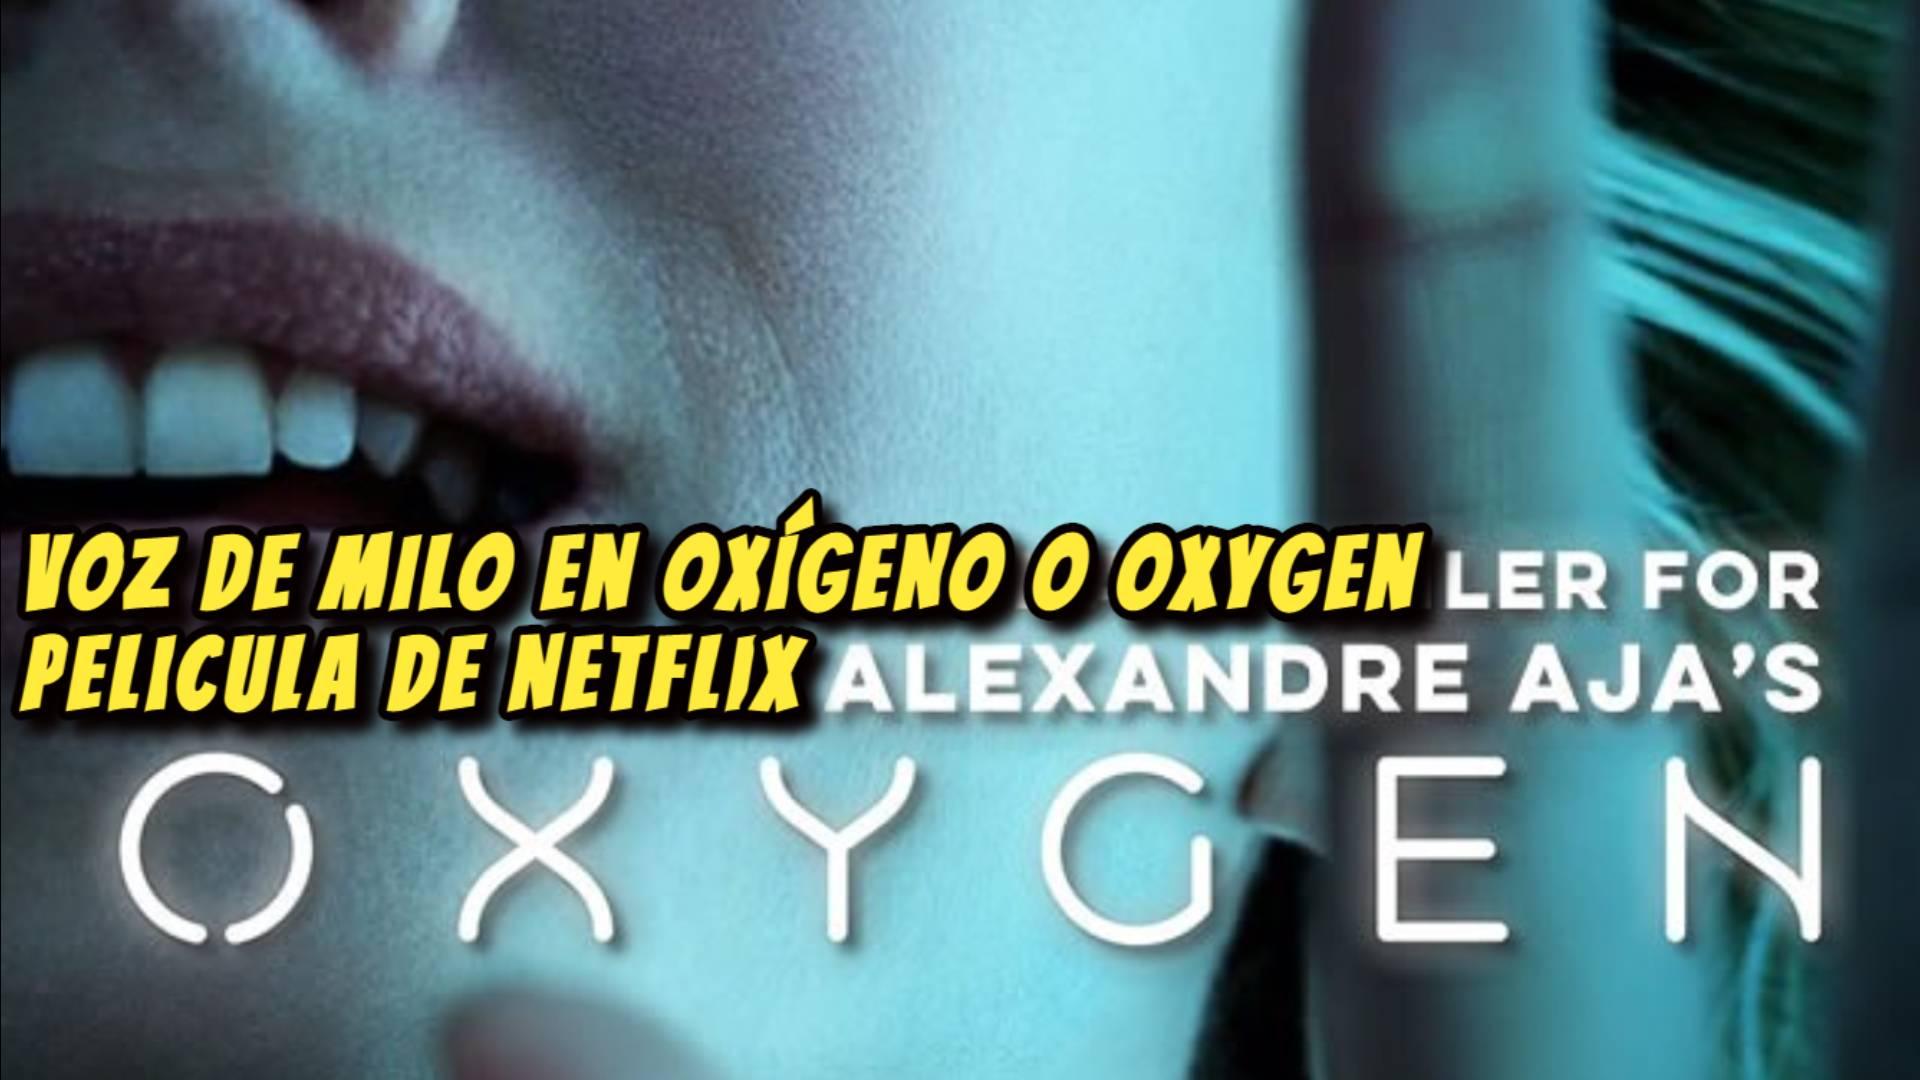 Voz De MILO en OXÍGENO o Oxygen Pelicula de Netflix